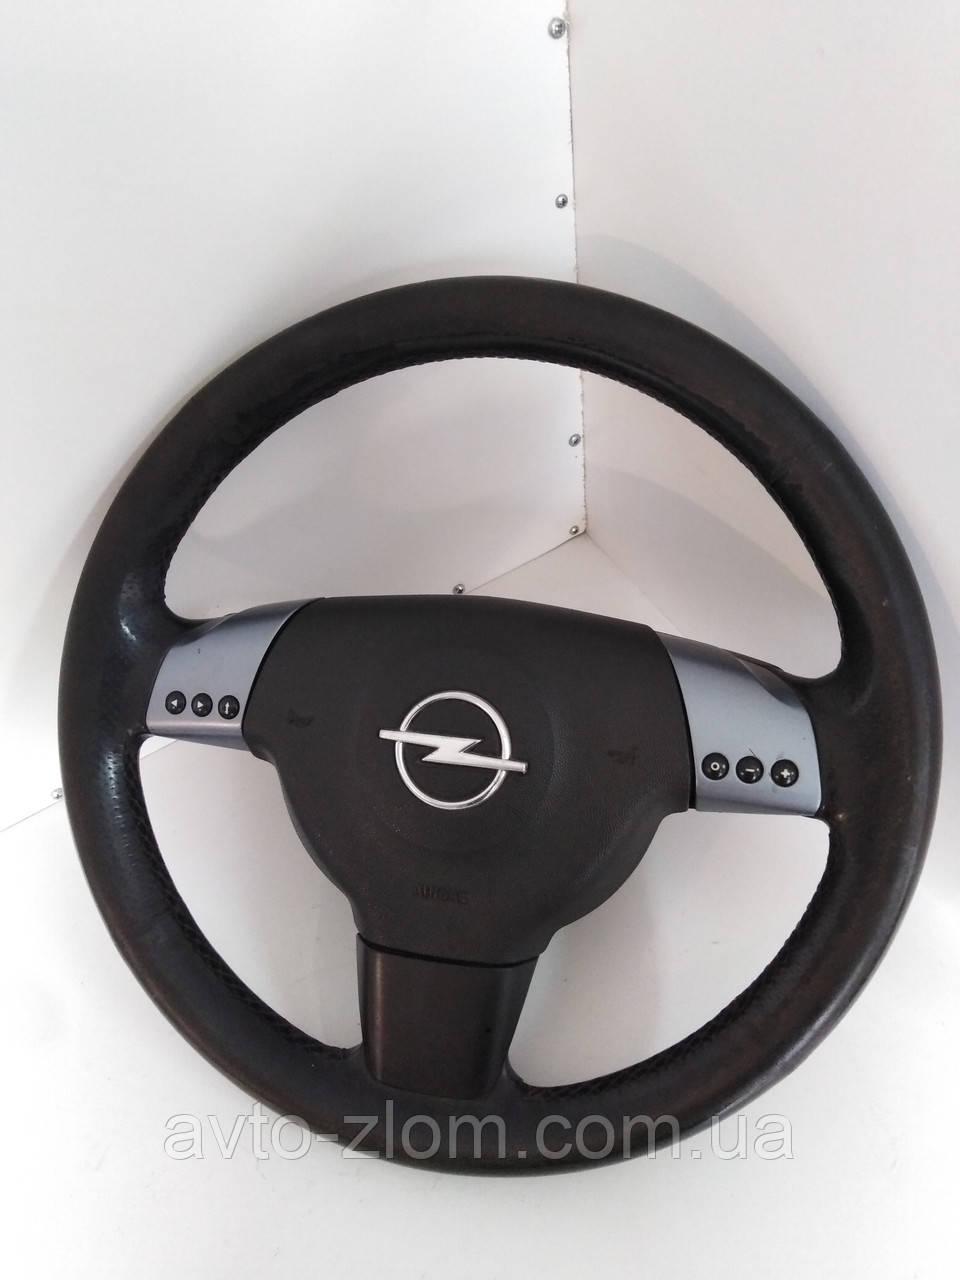 Руль Opel Vectra C, Опель Вектра Ц. GTS.